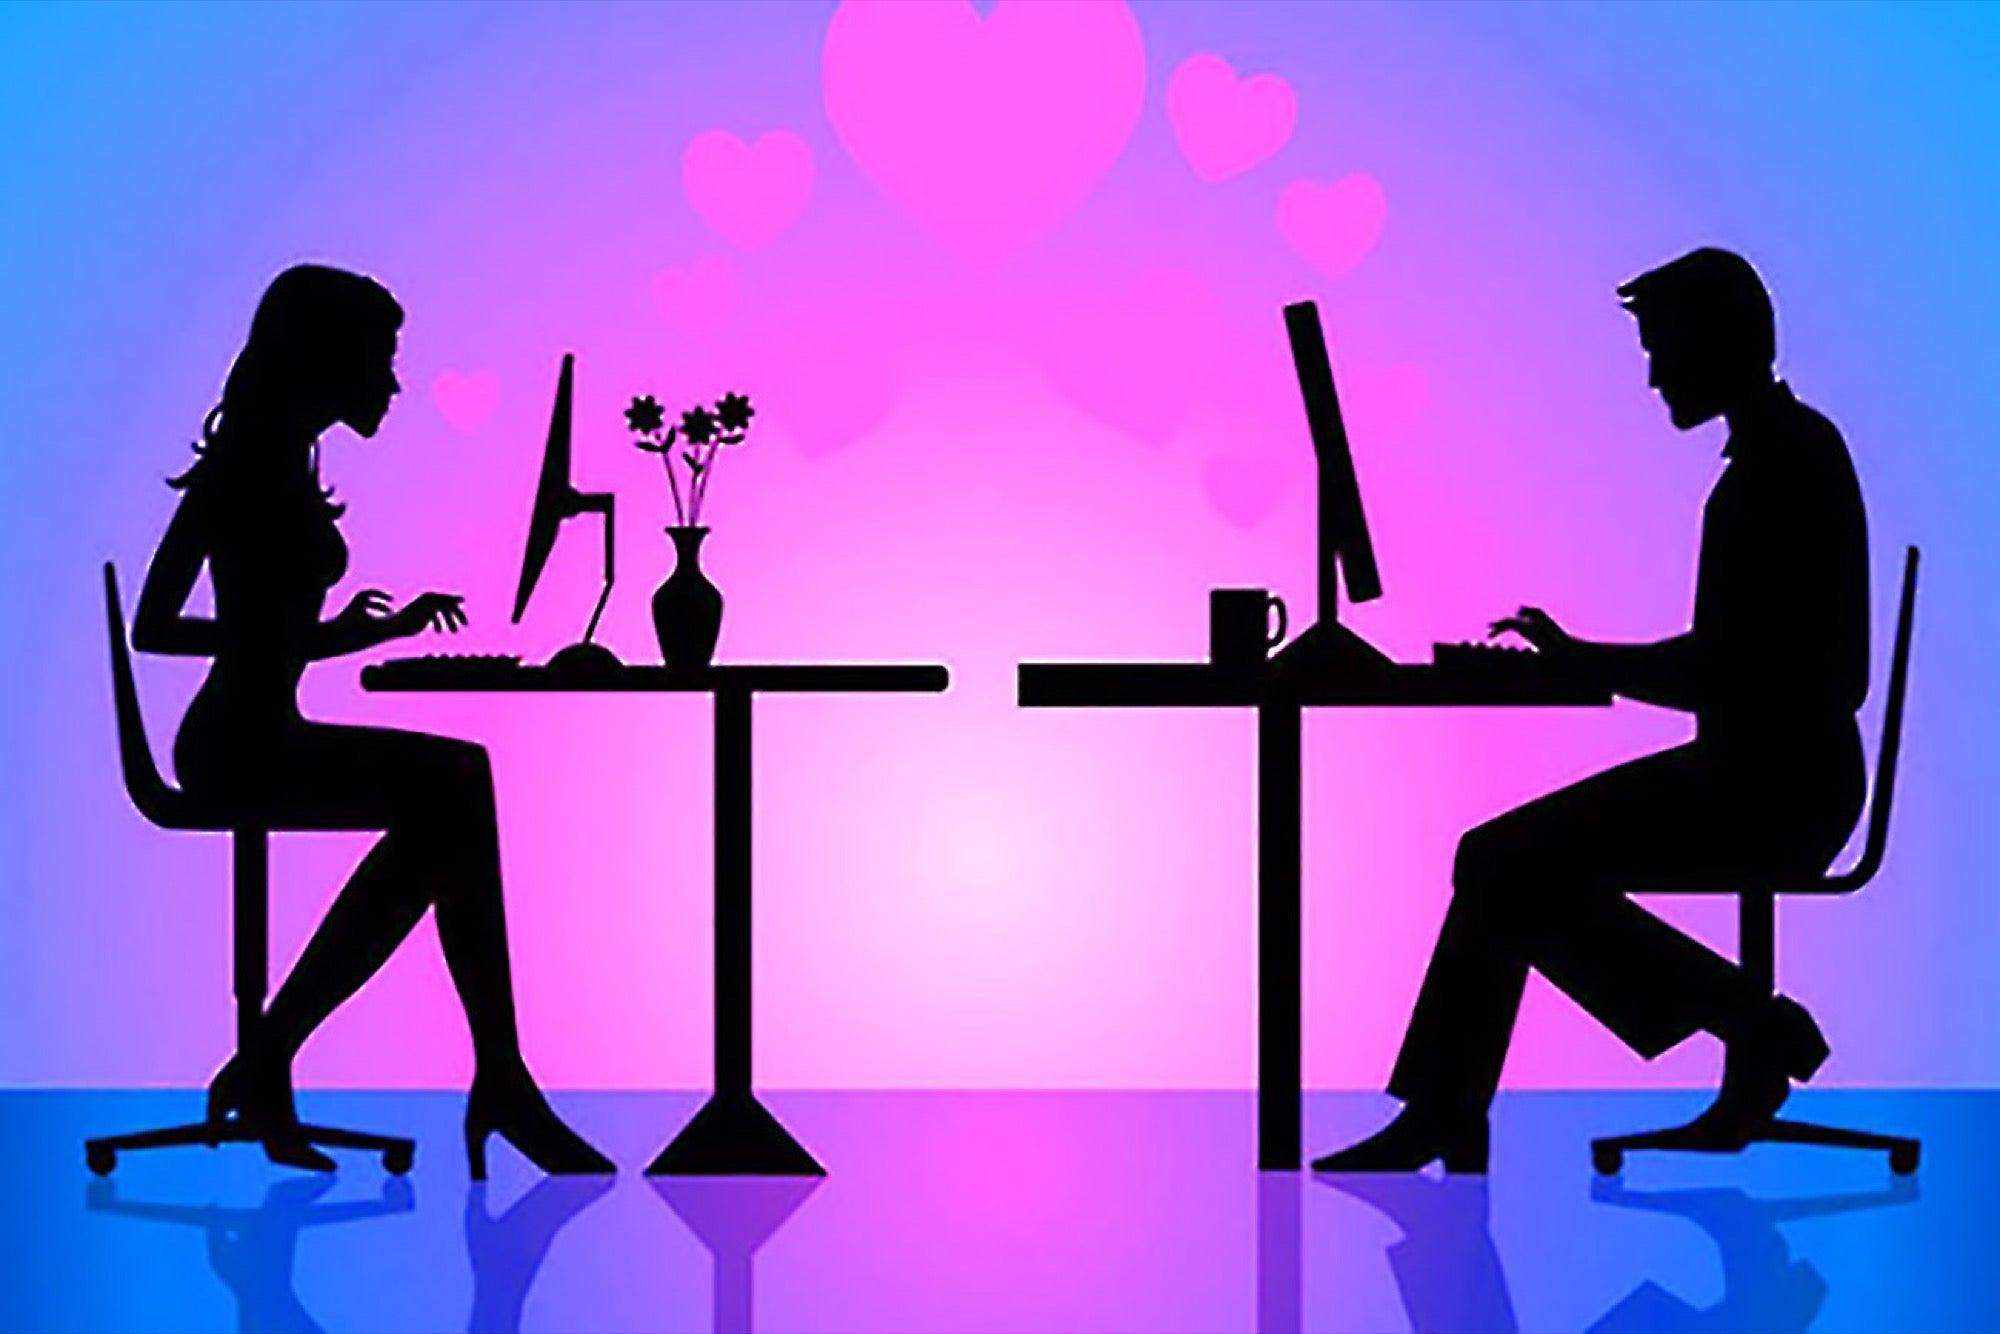 Hannes d haese online dating